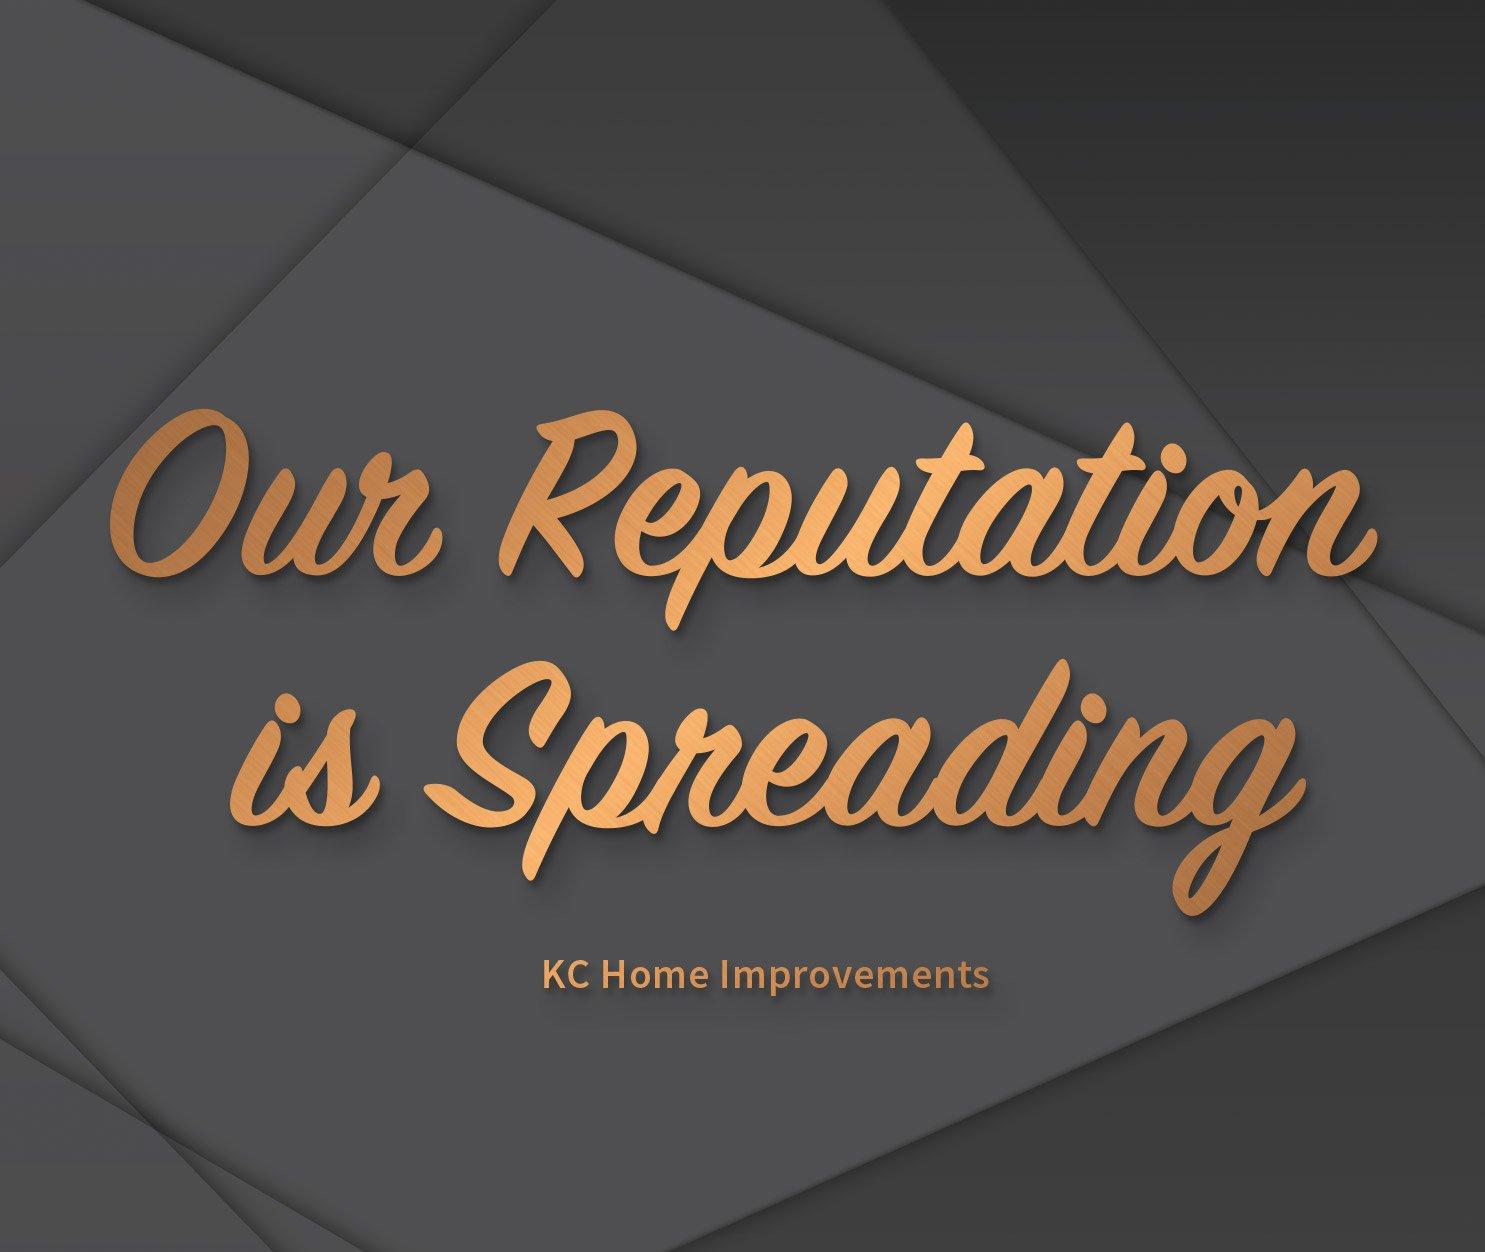 Tagline - KC Home Improvements